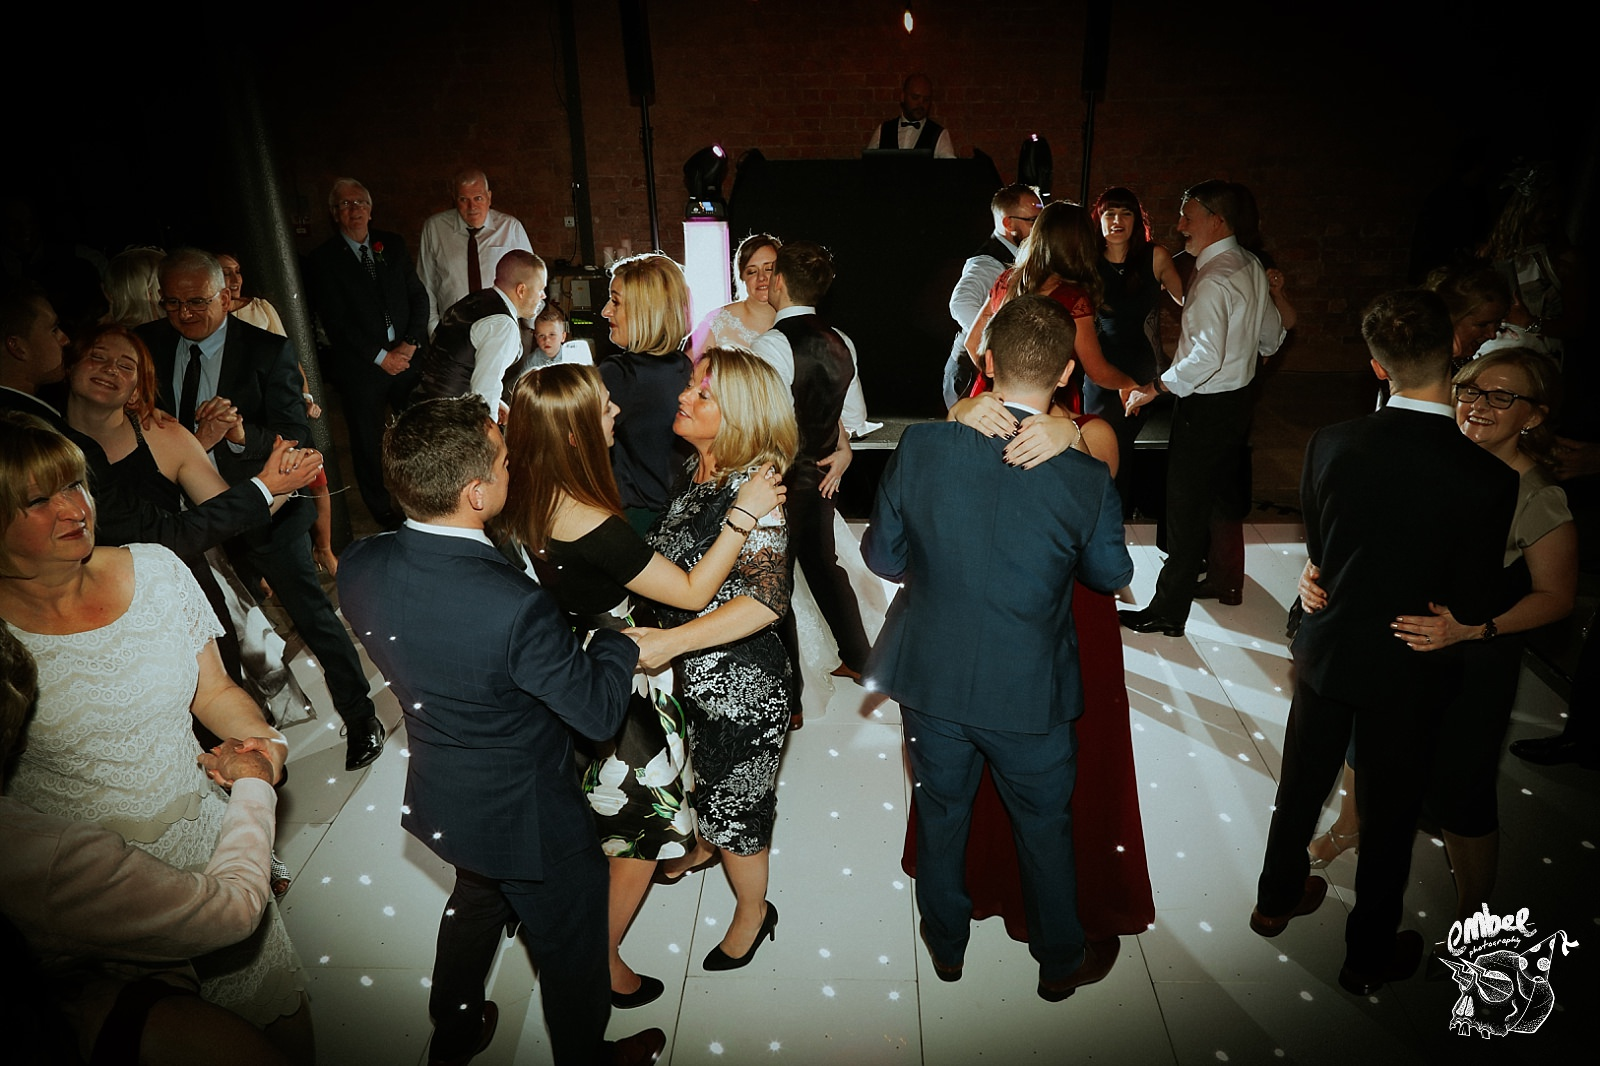 busy dance floor at a wedding